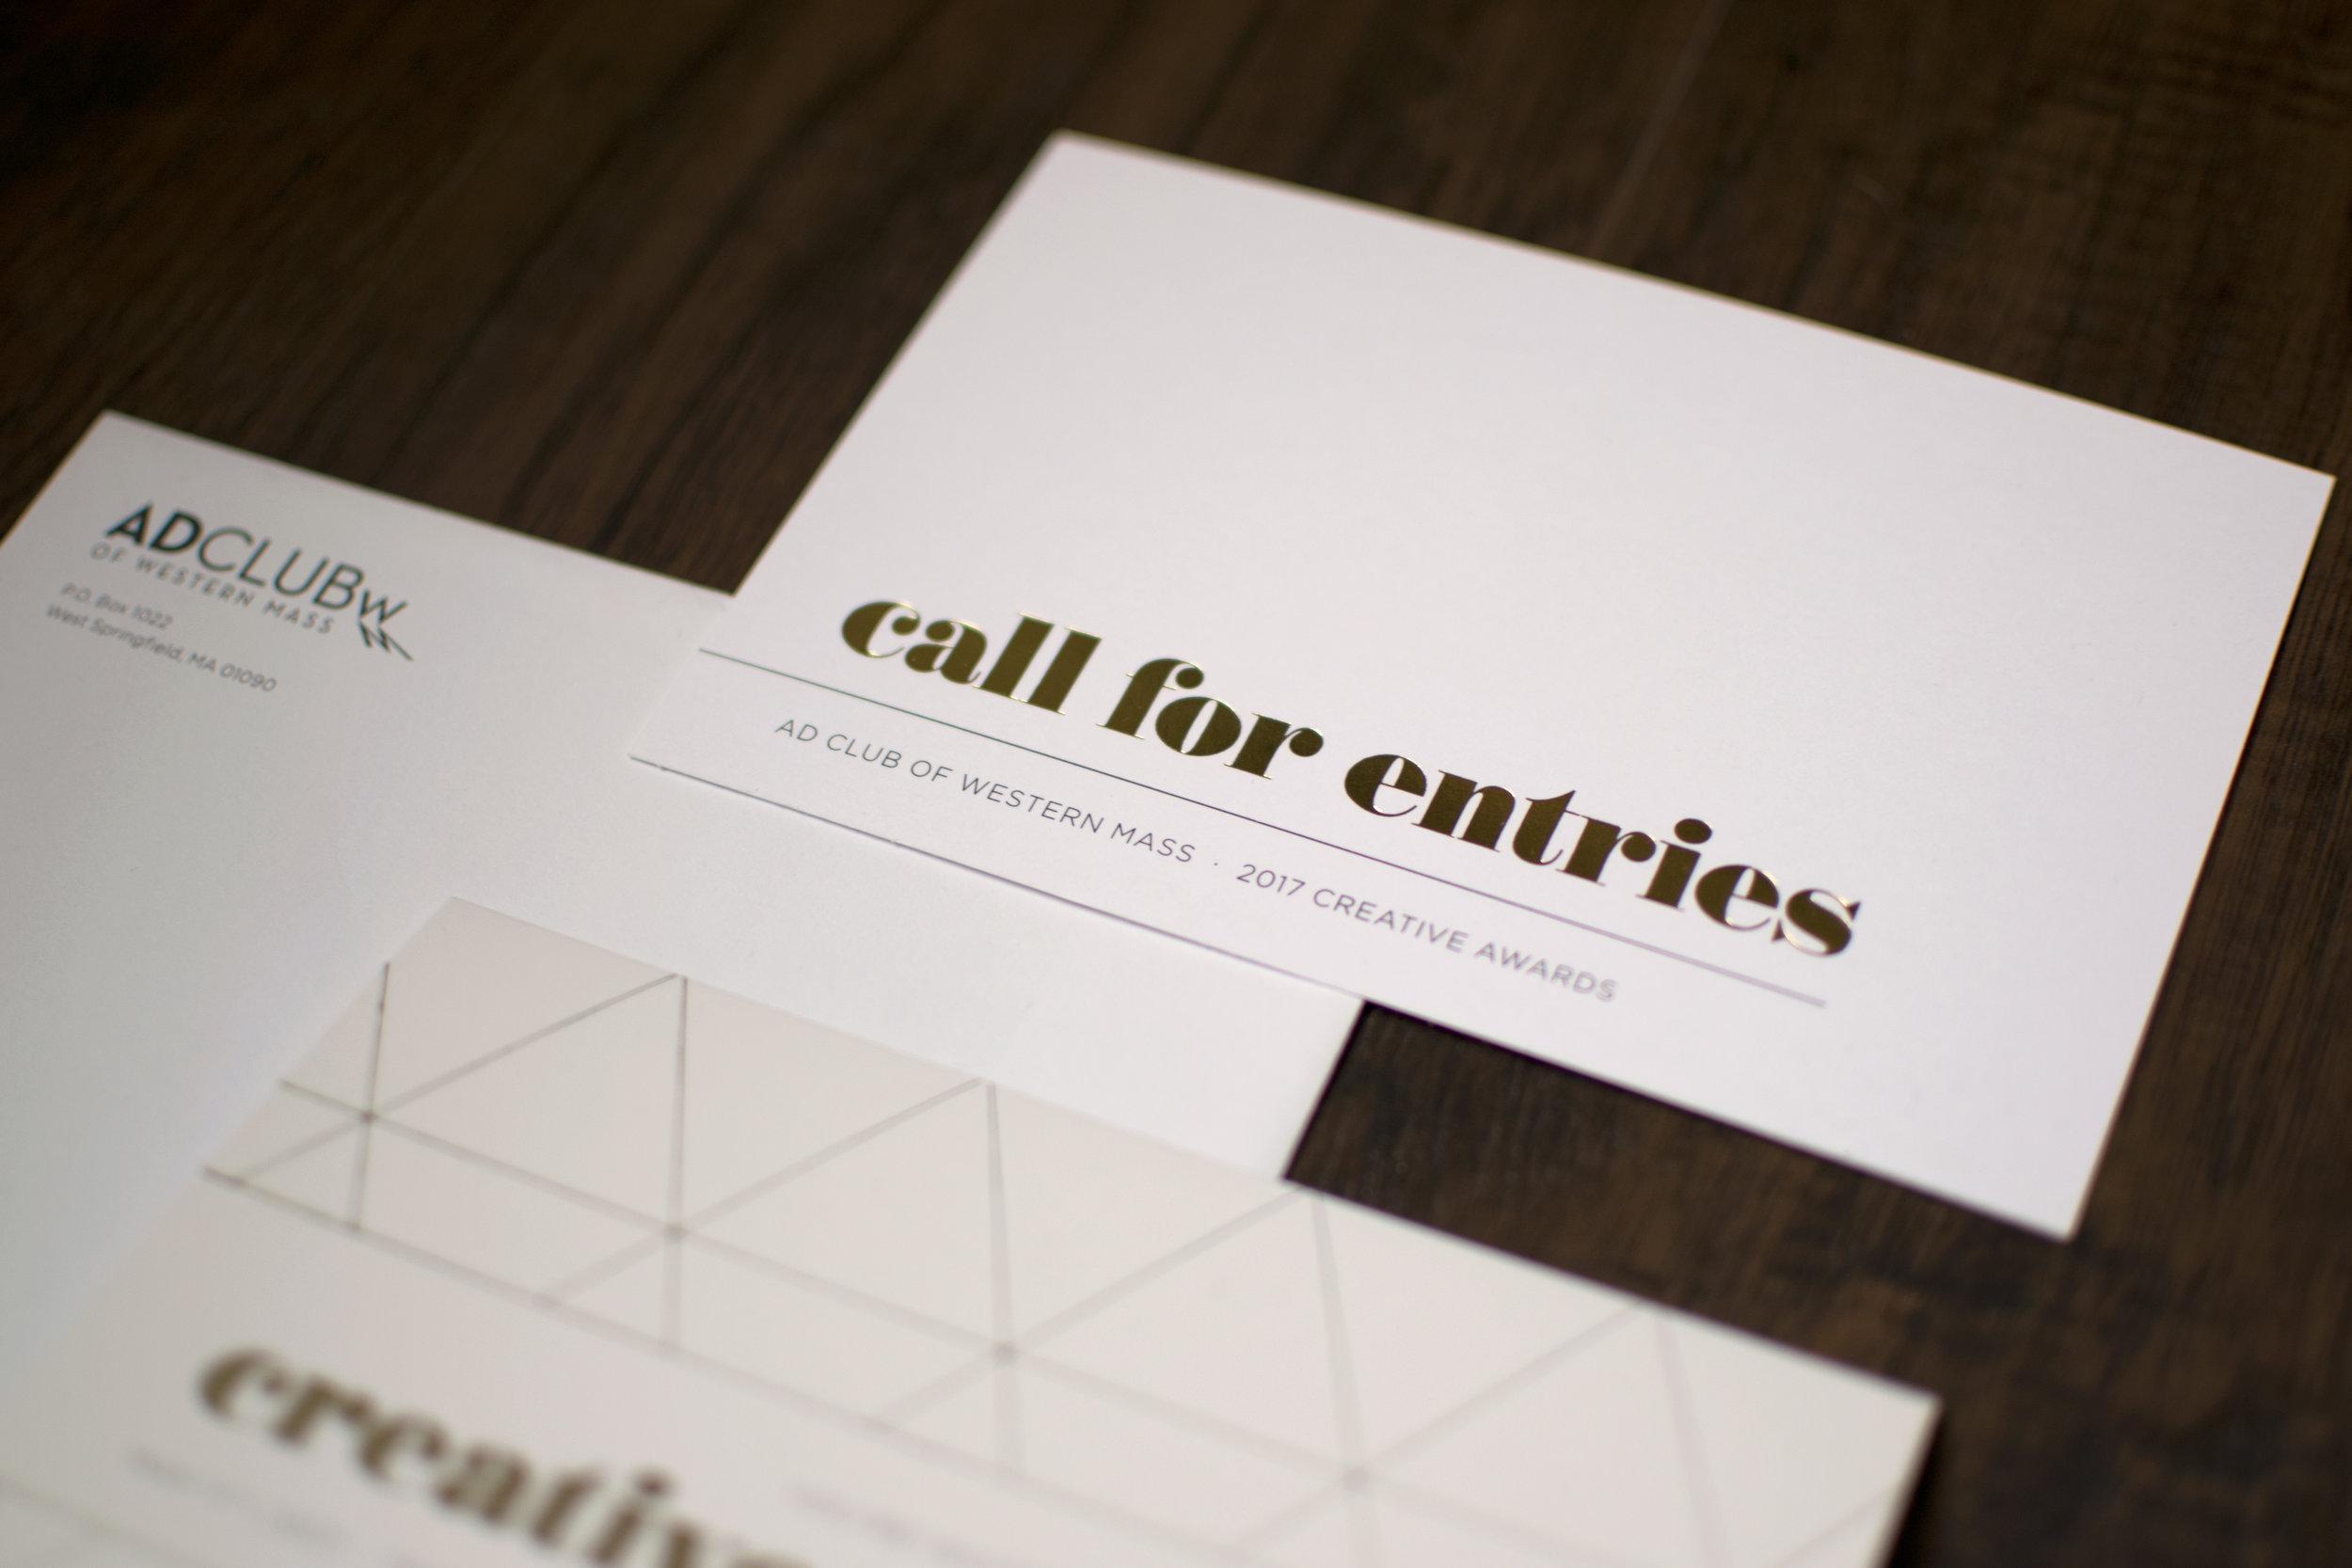 Creative Awards — Branding & Graphic Design Services